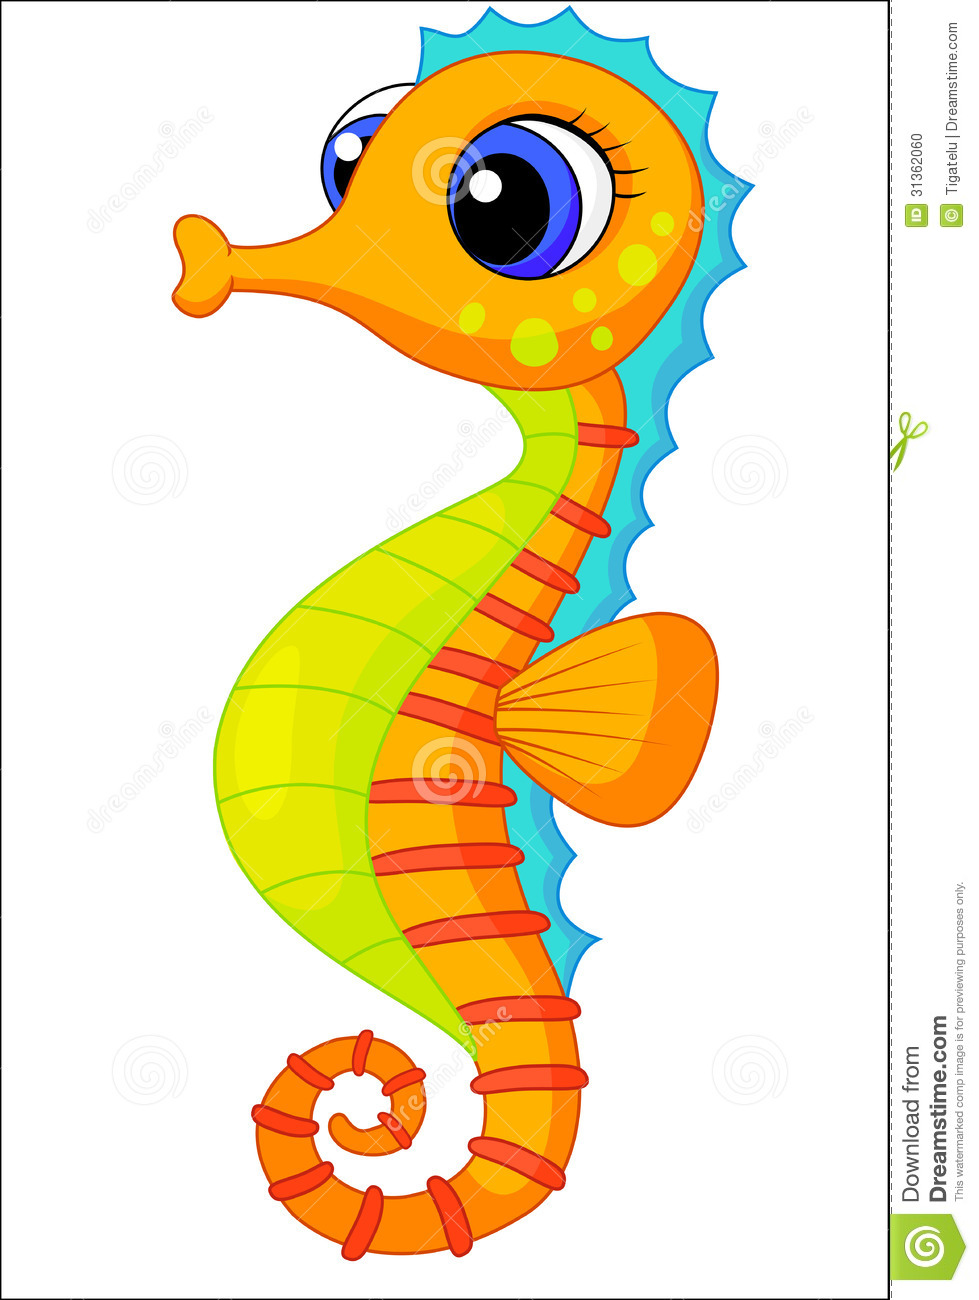 Seahorse clipart #7